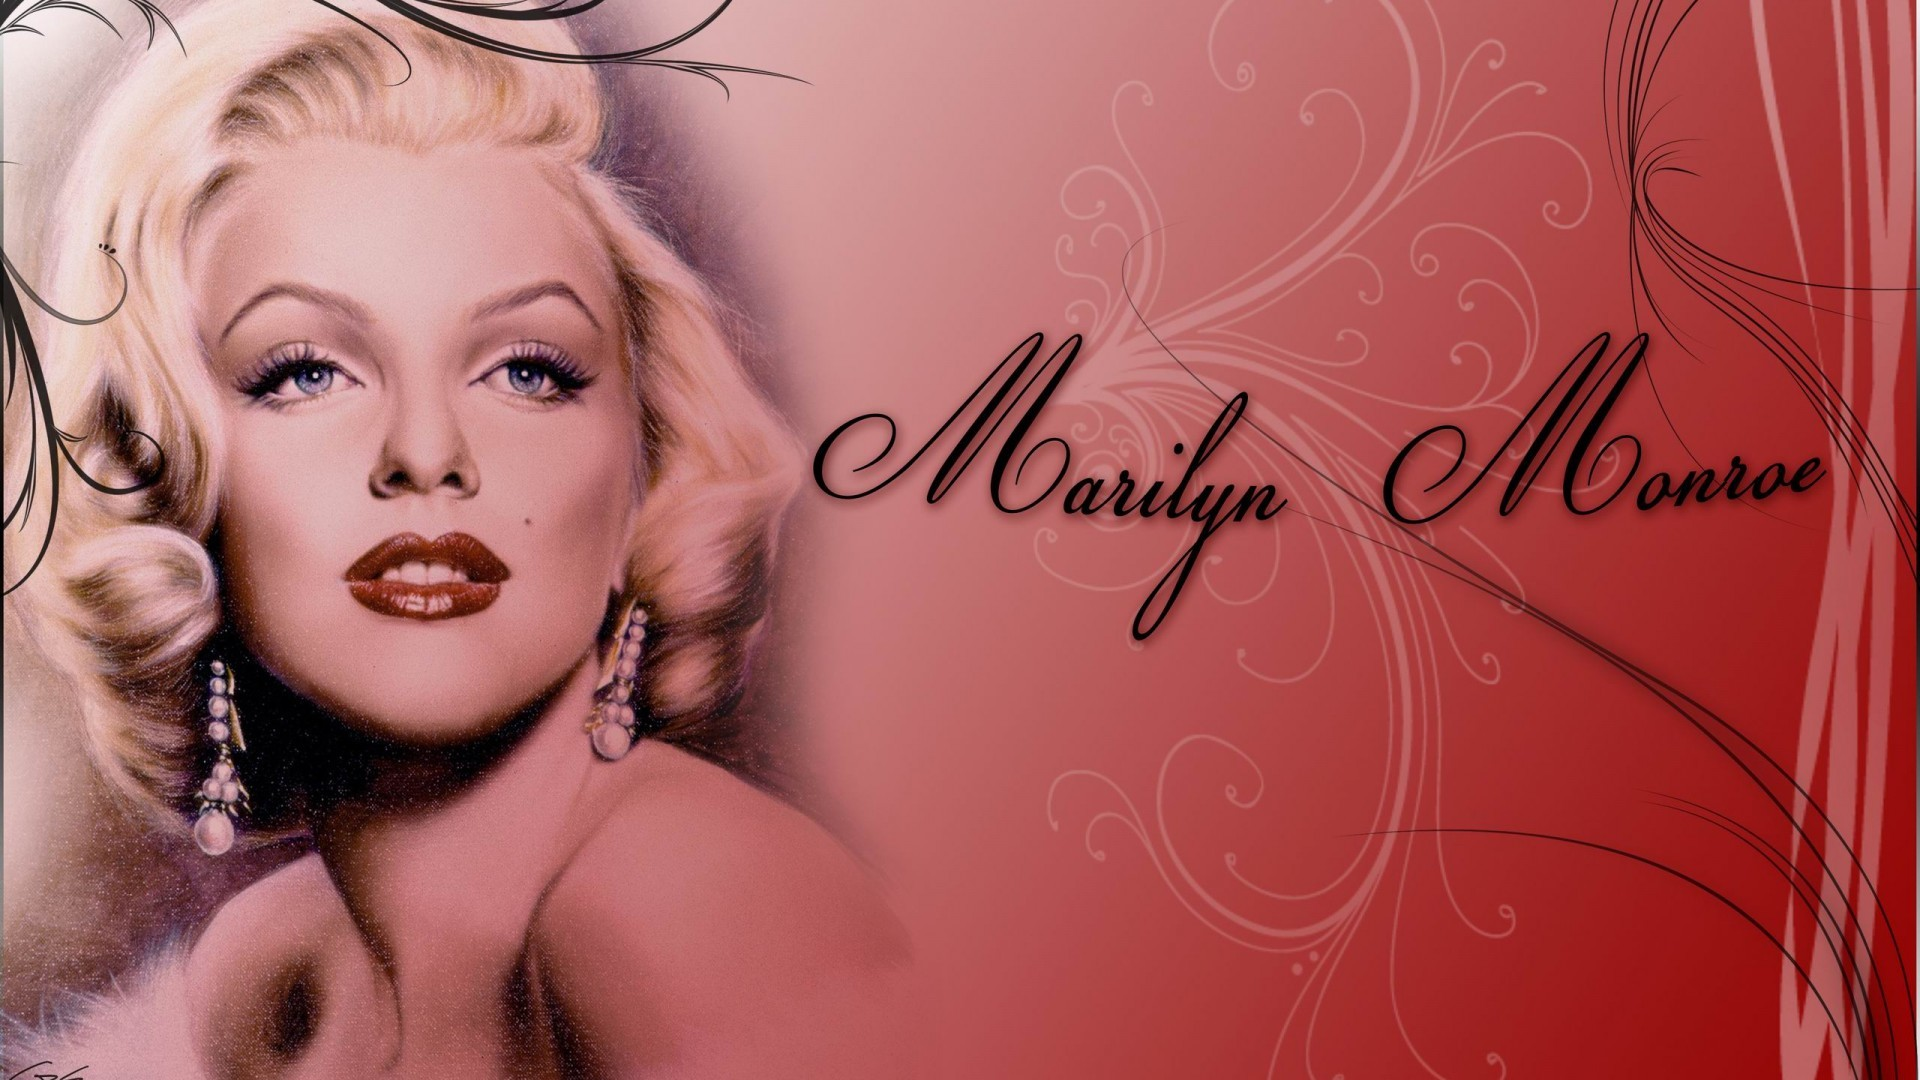 Res: 1920x1080, Marilyn Monroe Wallpapers Desktop